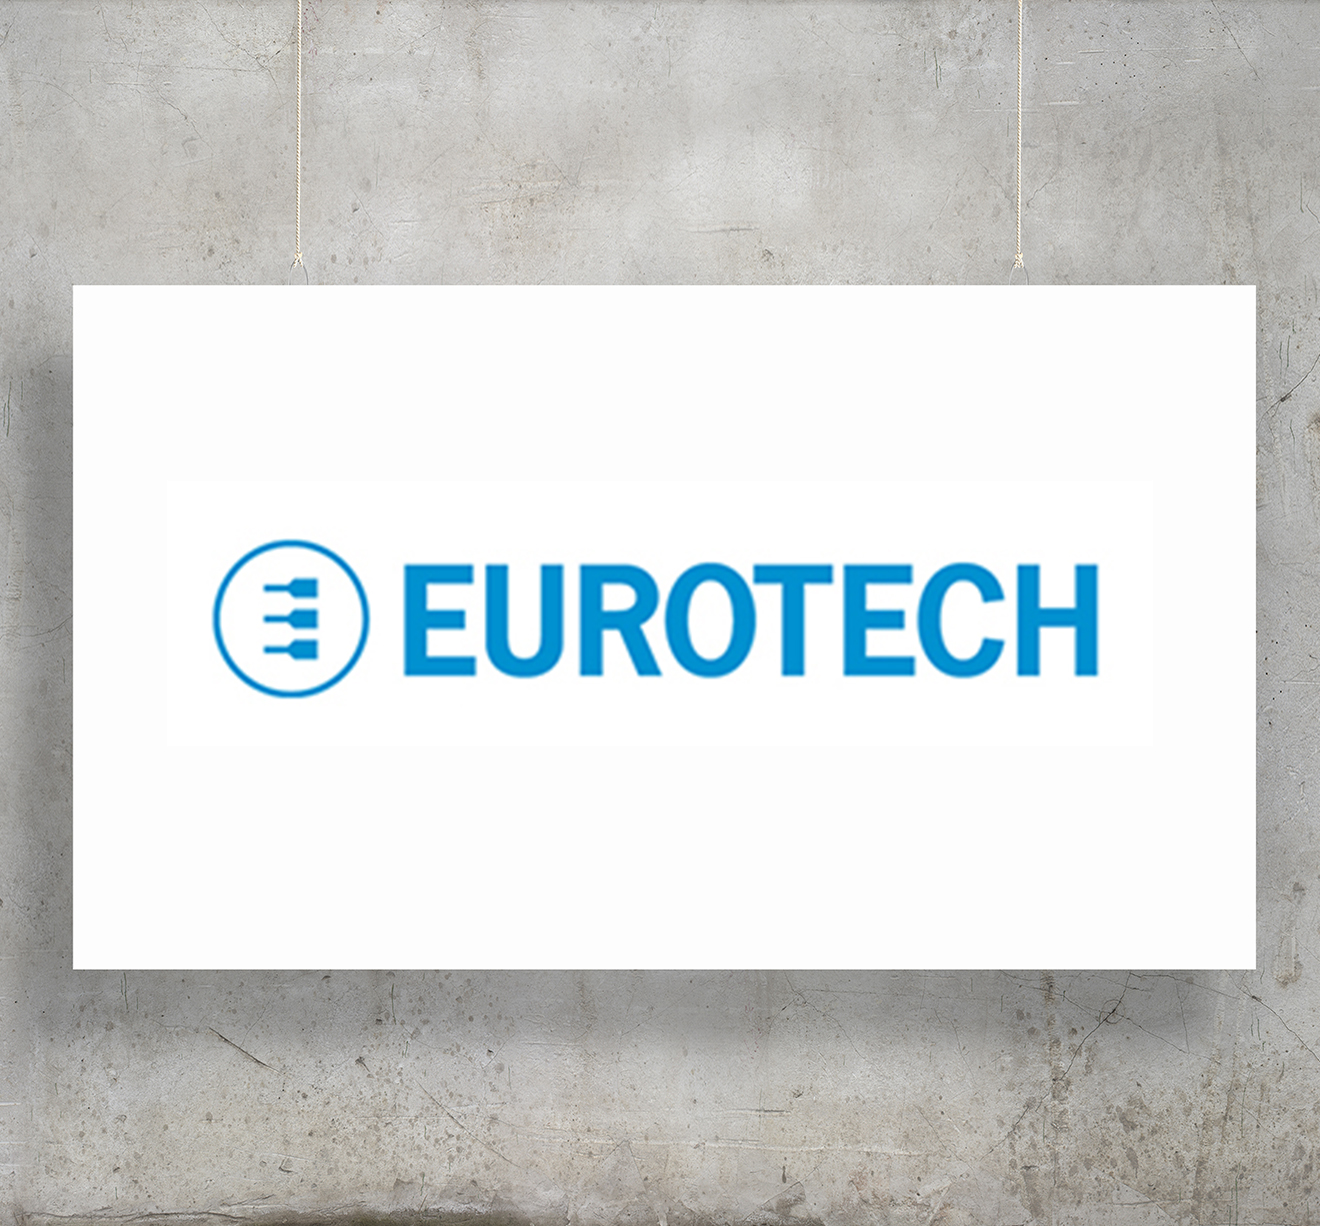 Content Hub Eurotech